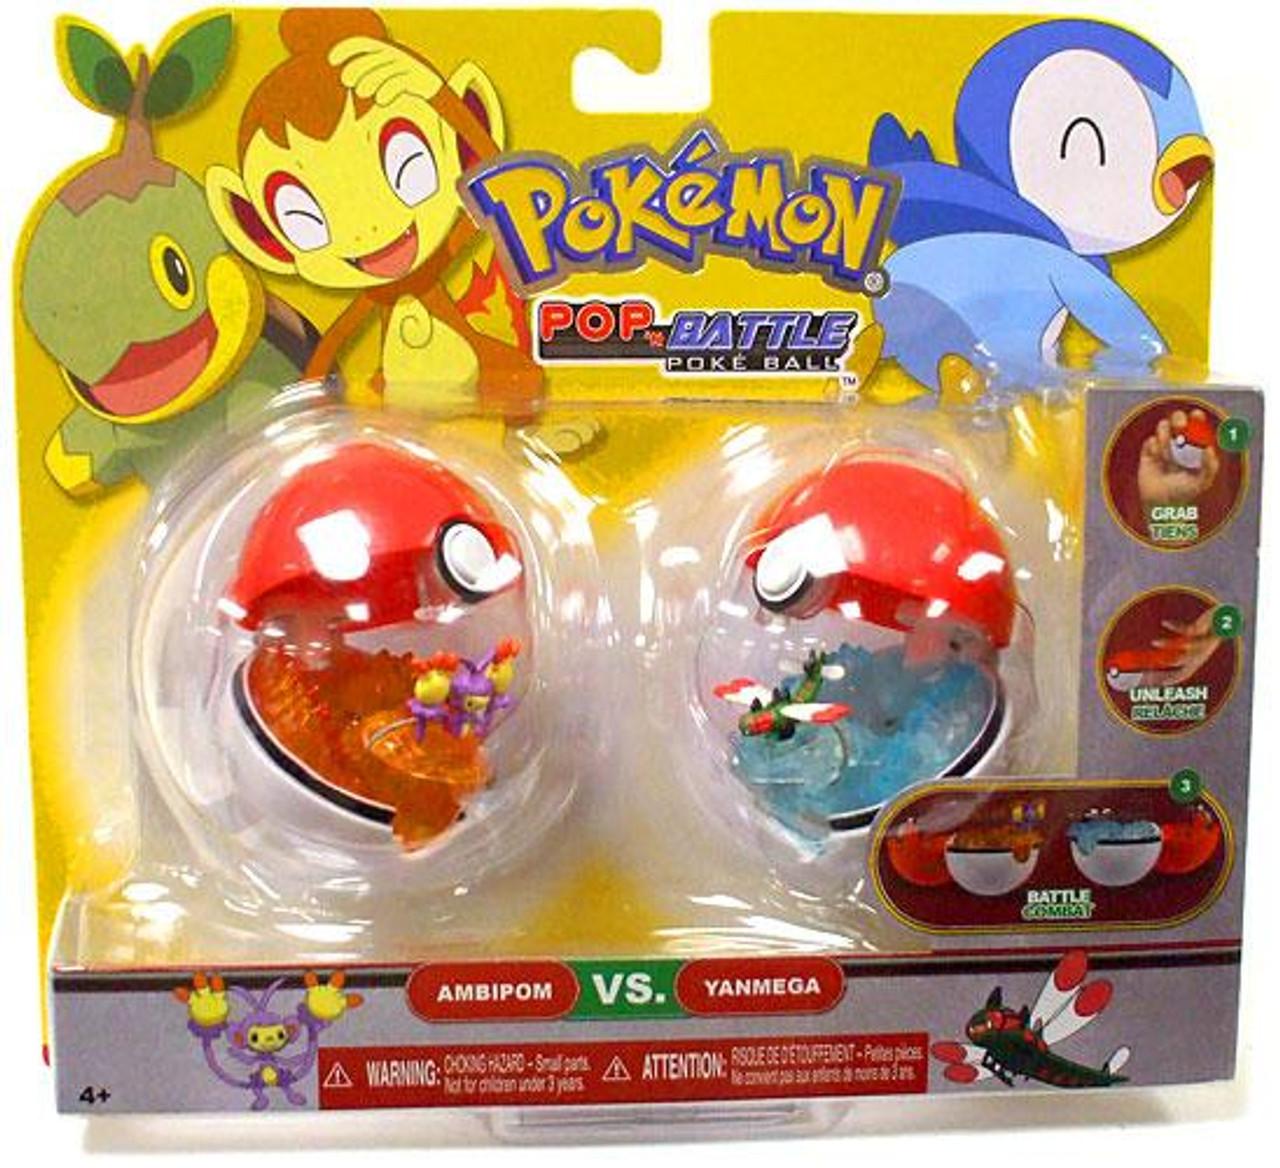 Pokemon Pop n Battle Ambipom & Yanmega Pokeball 2-Pack